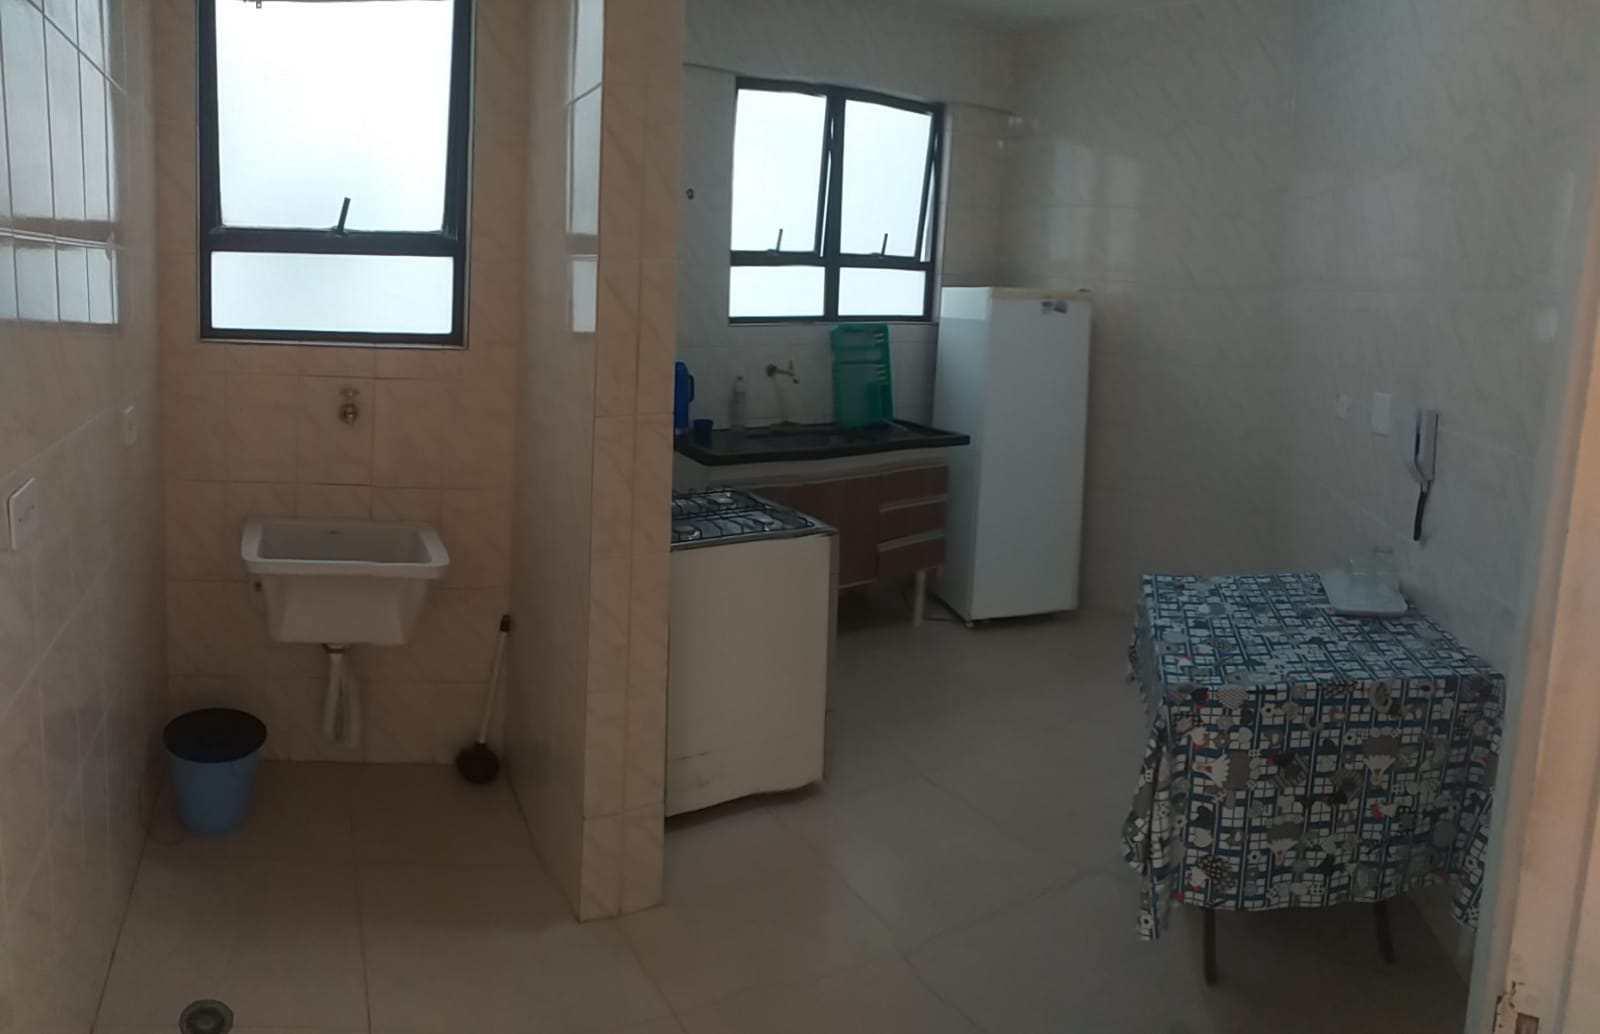 Apartamento com 2 dorms, Enseada, Guarujá - R$ 230 mil, Cod: 4645